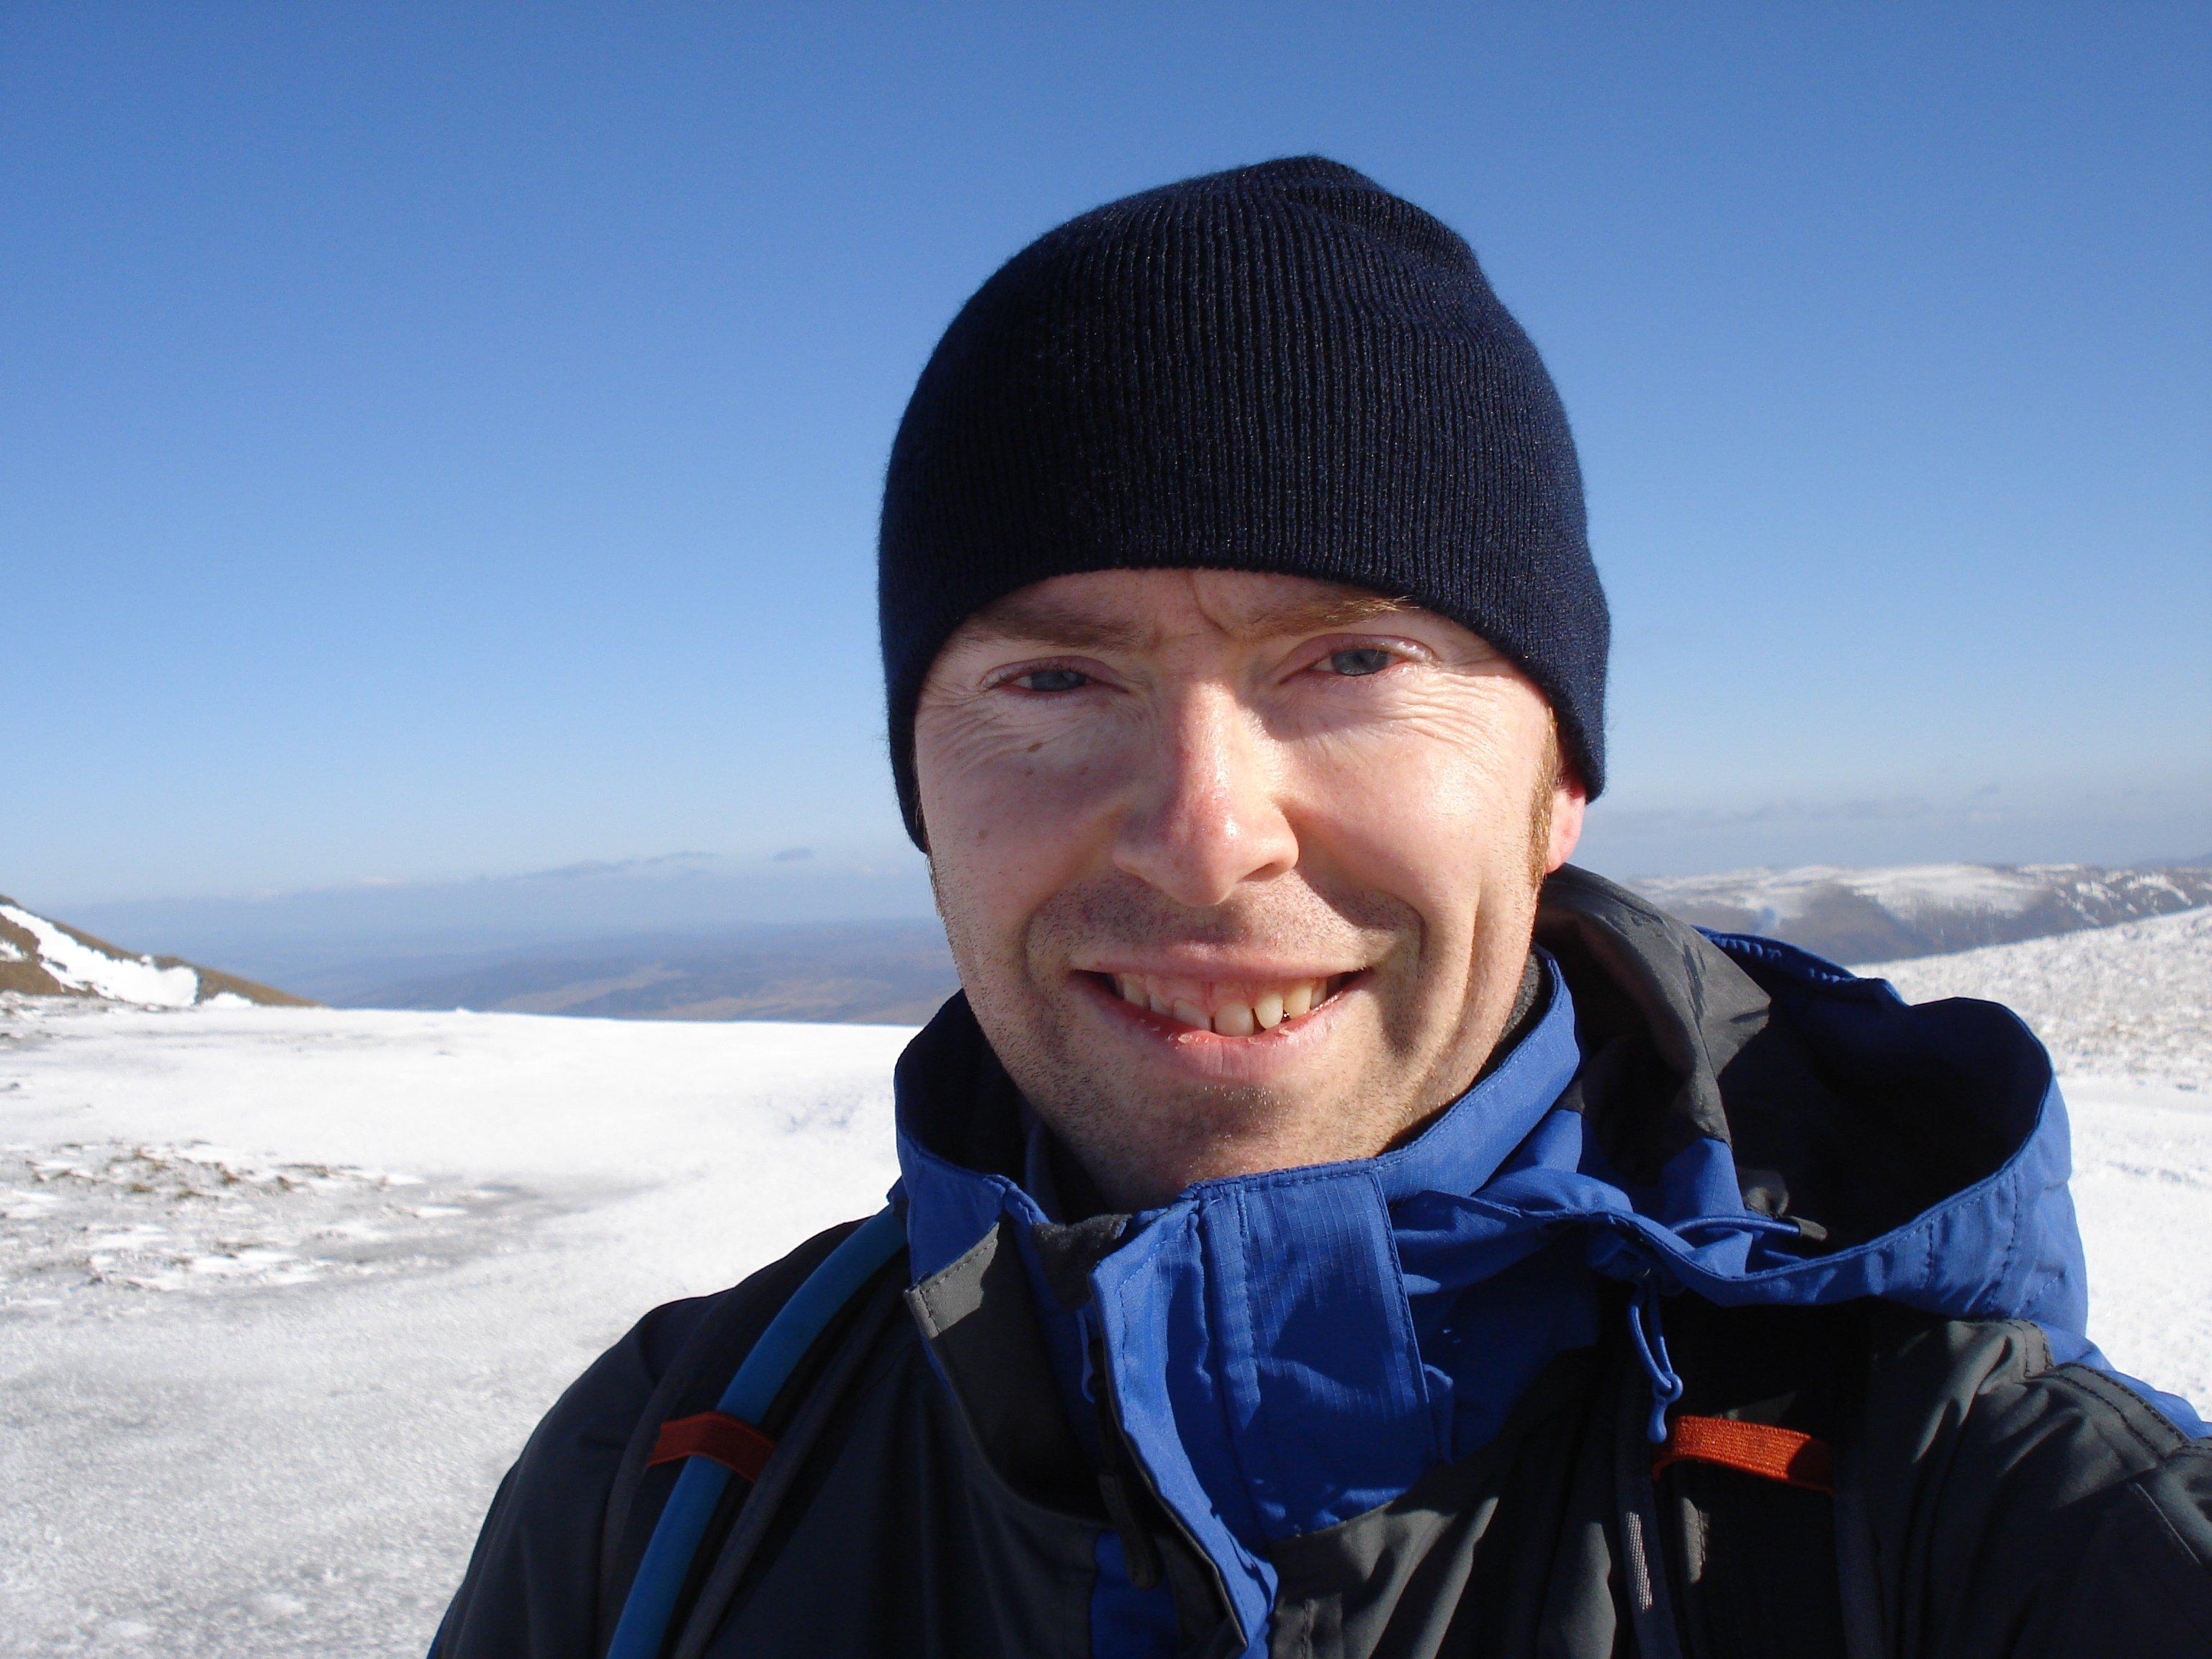 Br Antony Jukes in the Scottish Highlands